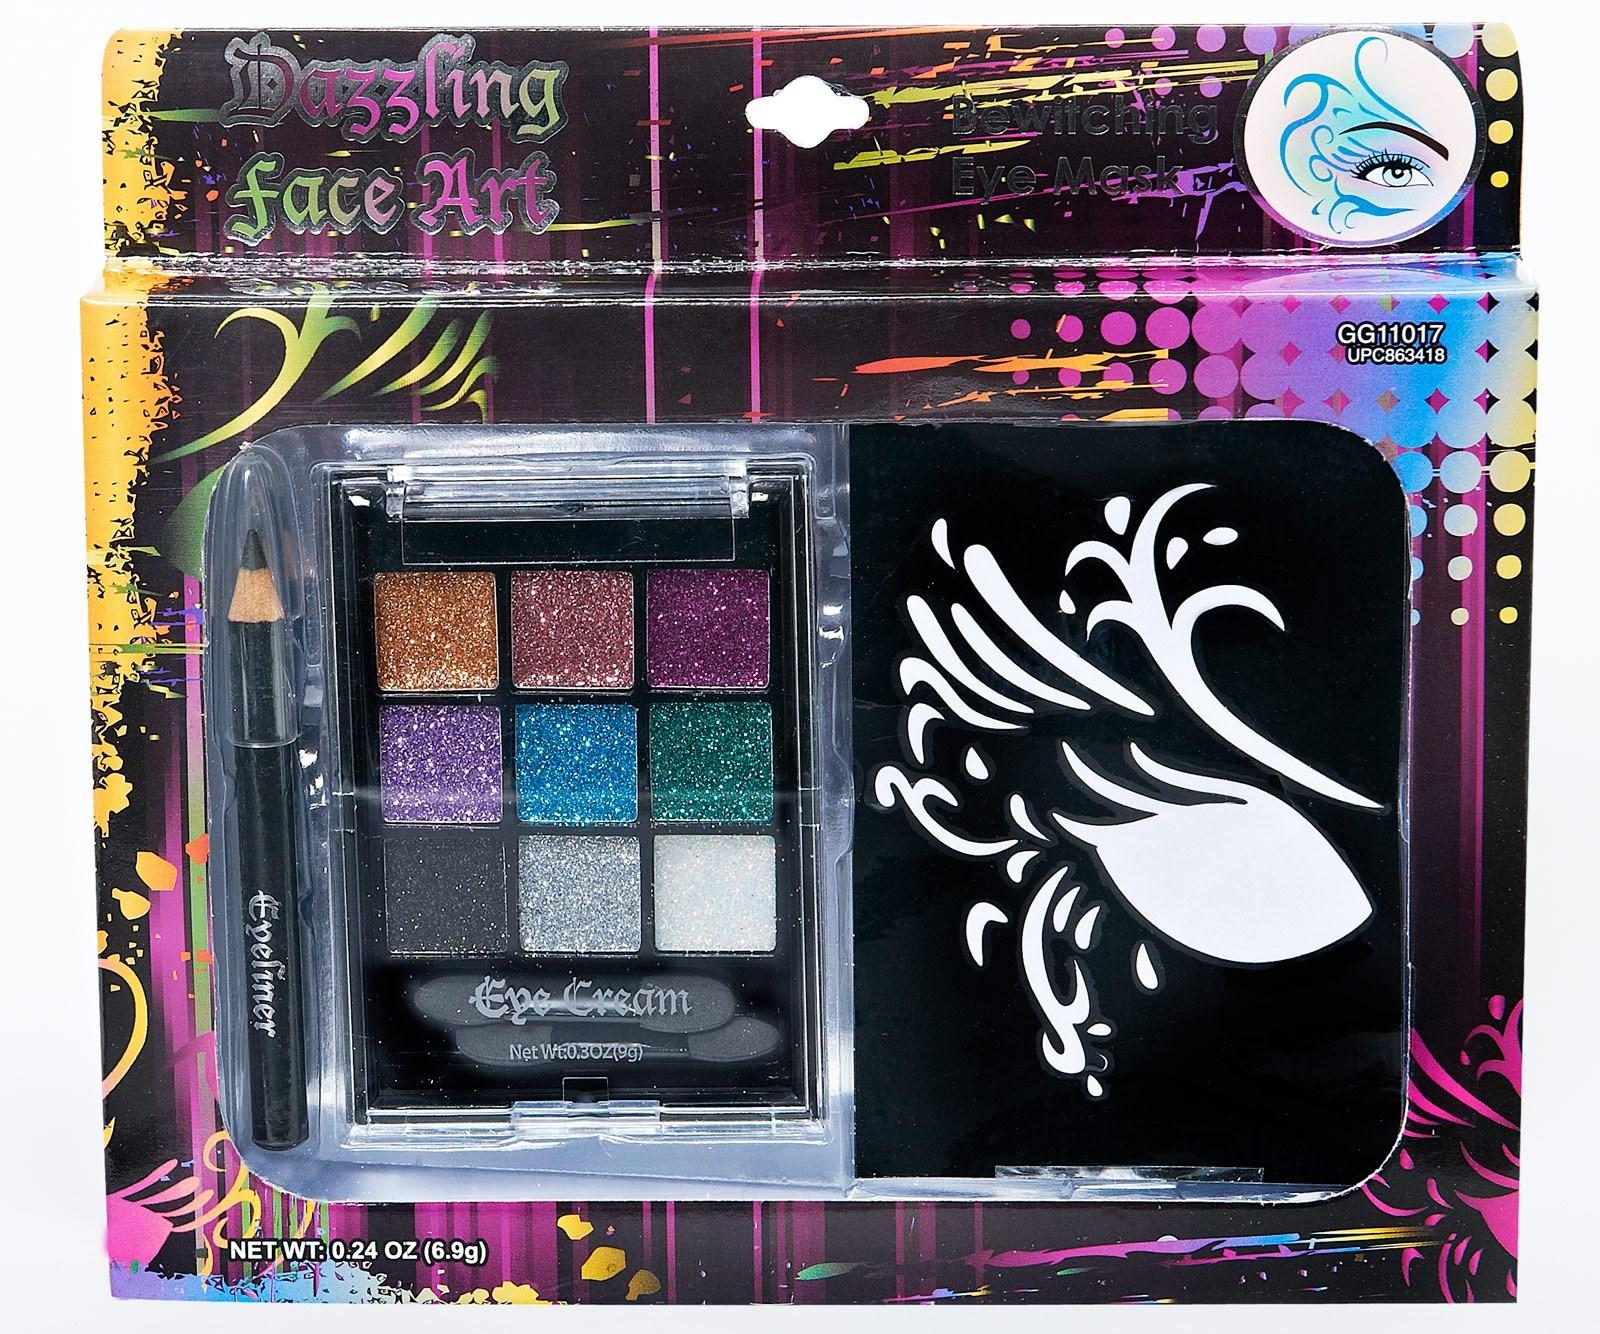 Image of Bewitching Face Art Makeup Kit